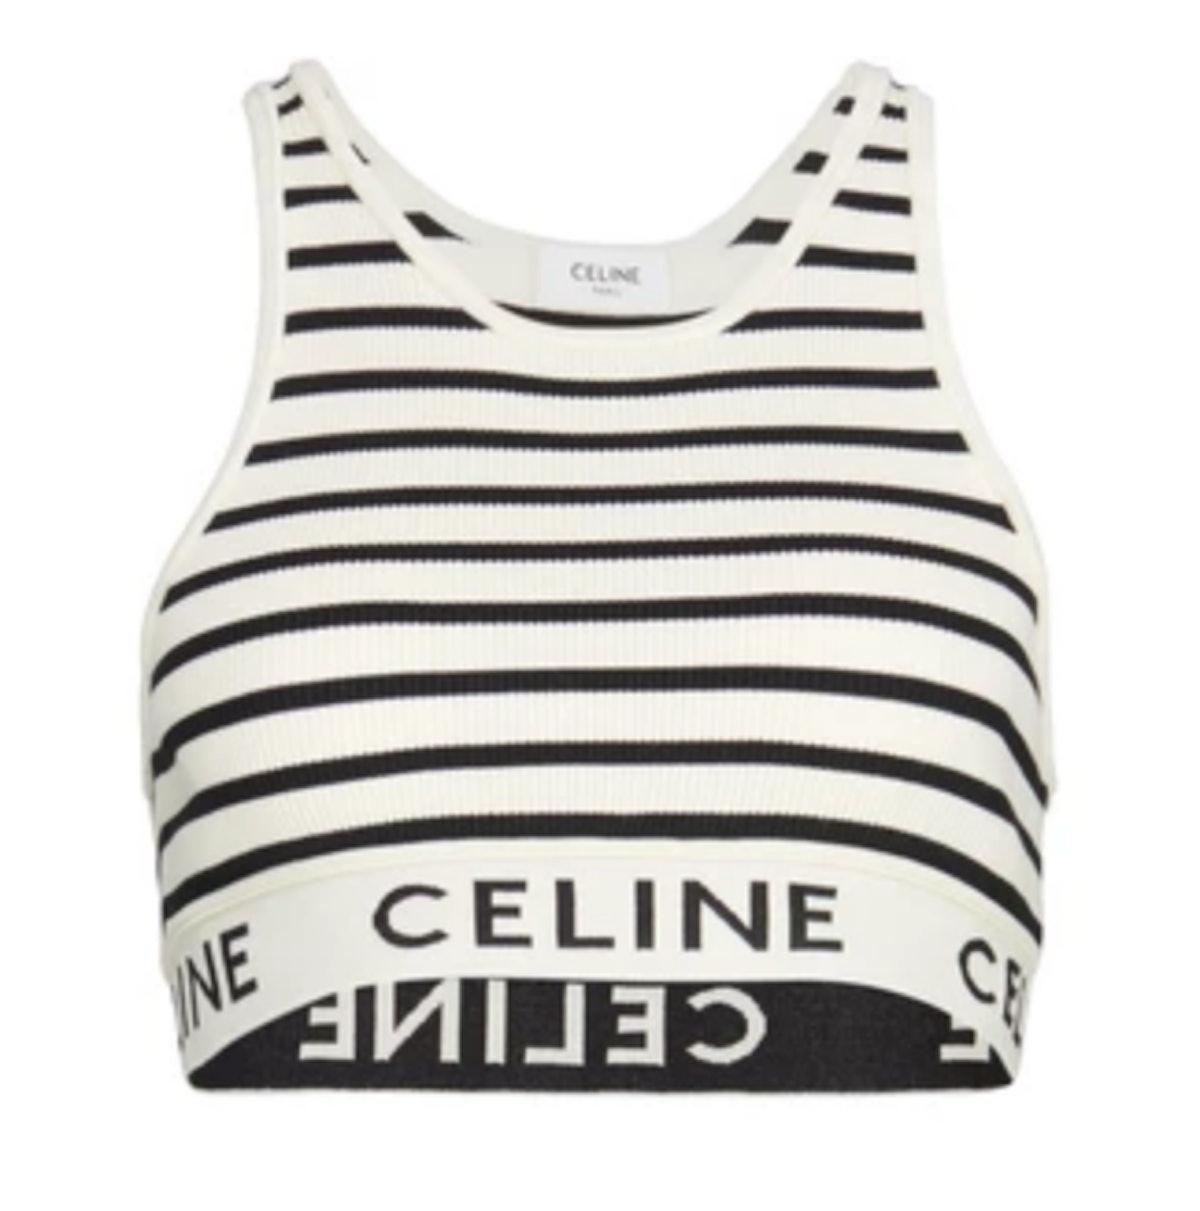 CELINE's black and white striped sports bra.